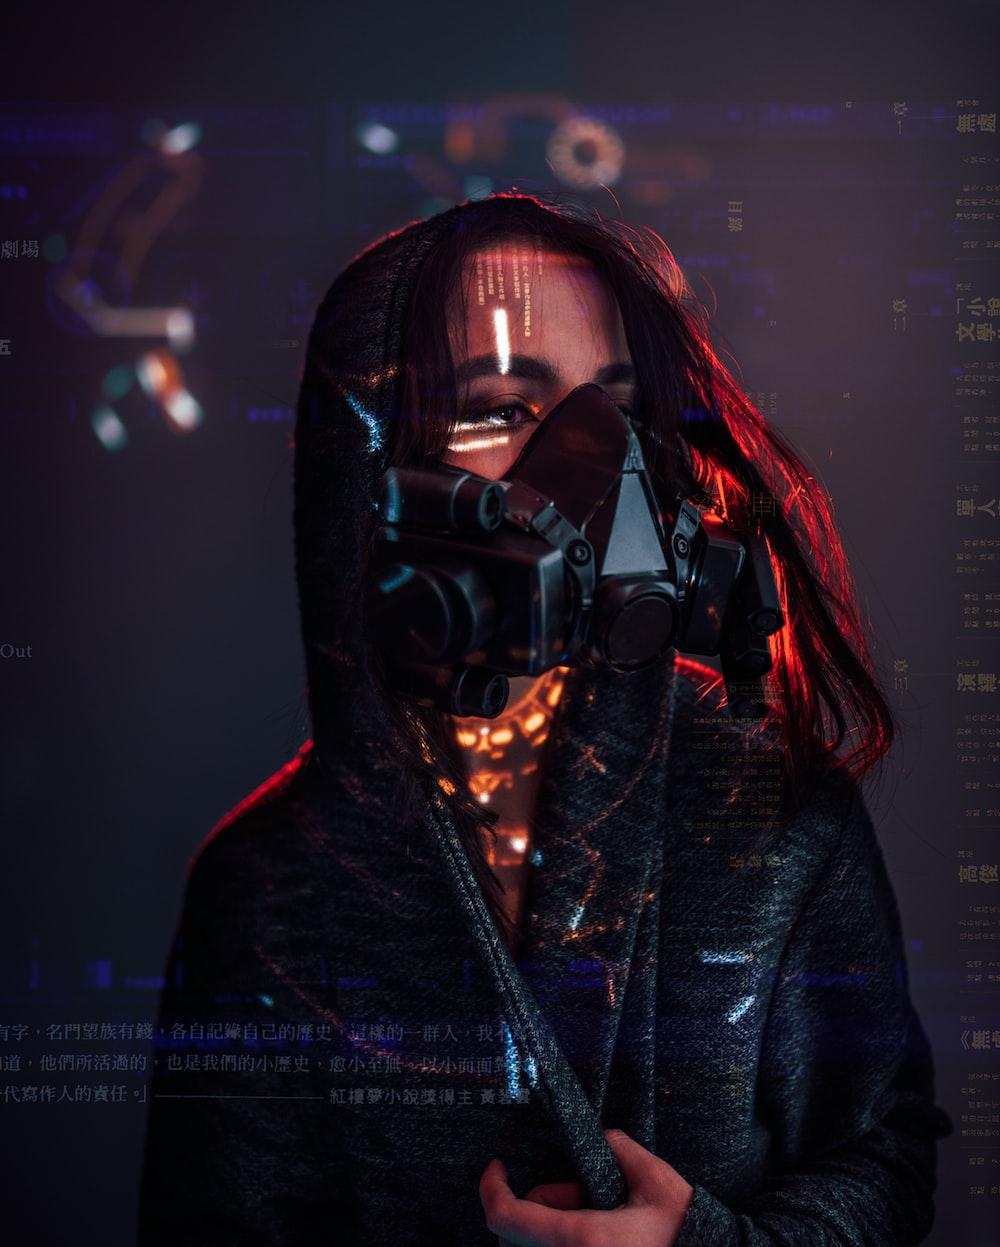 woman in black leather jacket wearing black mask